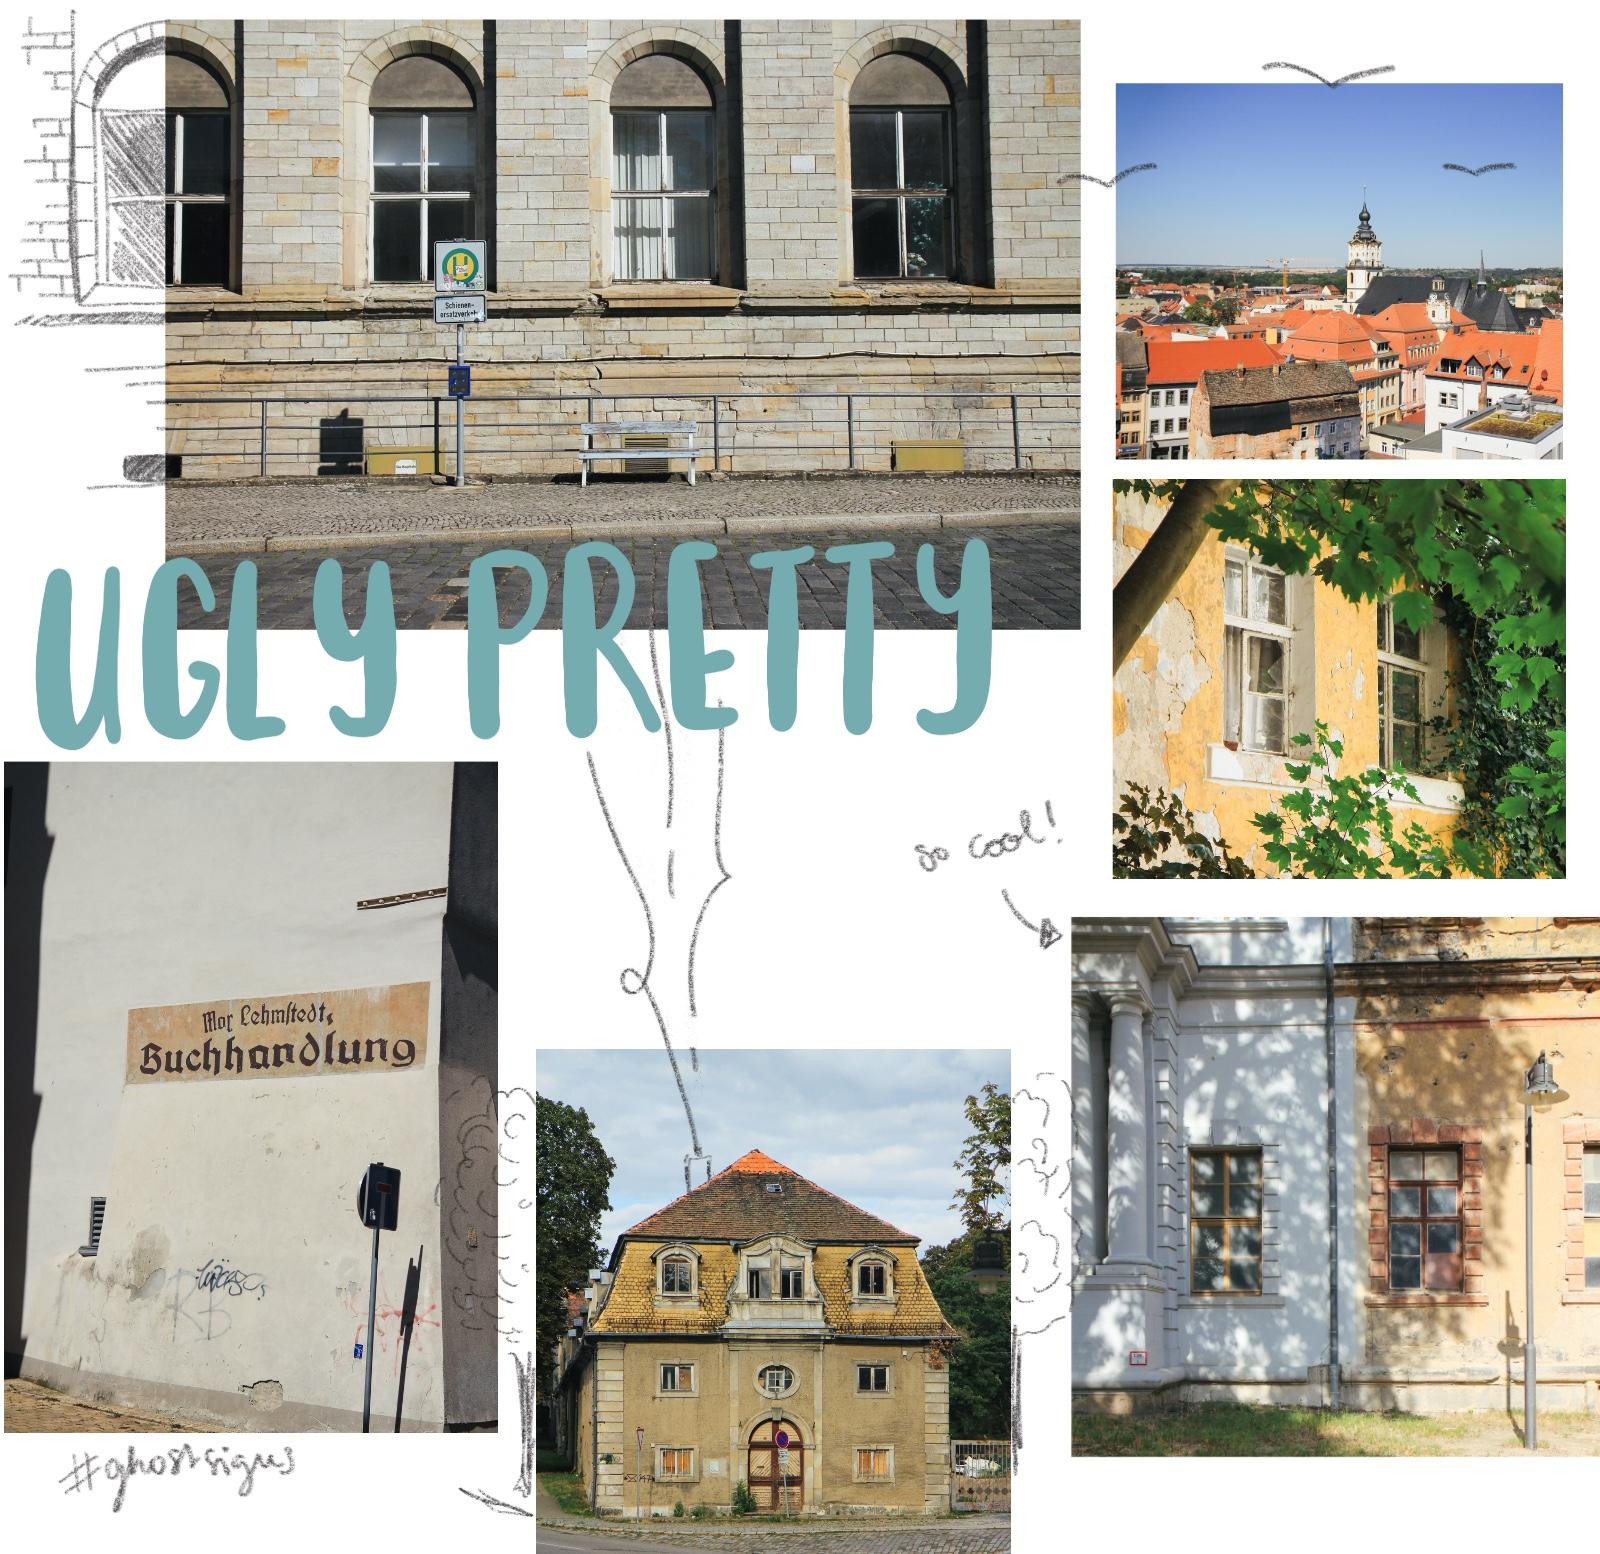 Architektur Saale-Unstrut Weißenfels Fotolocation